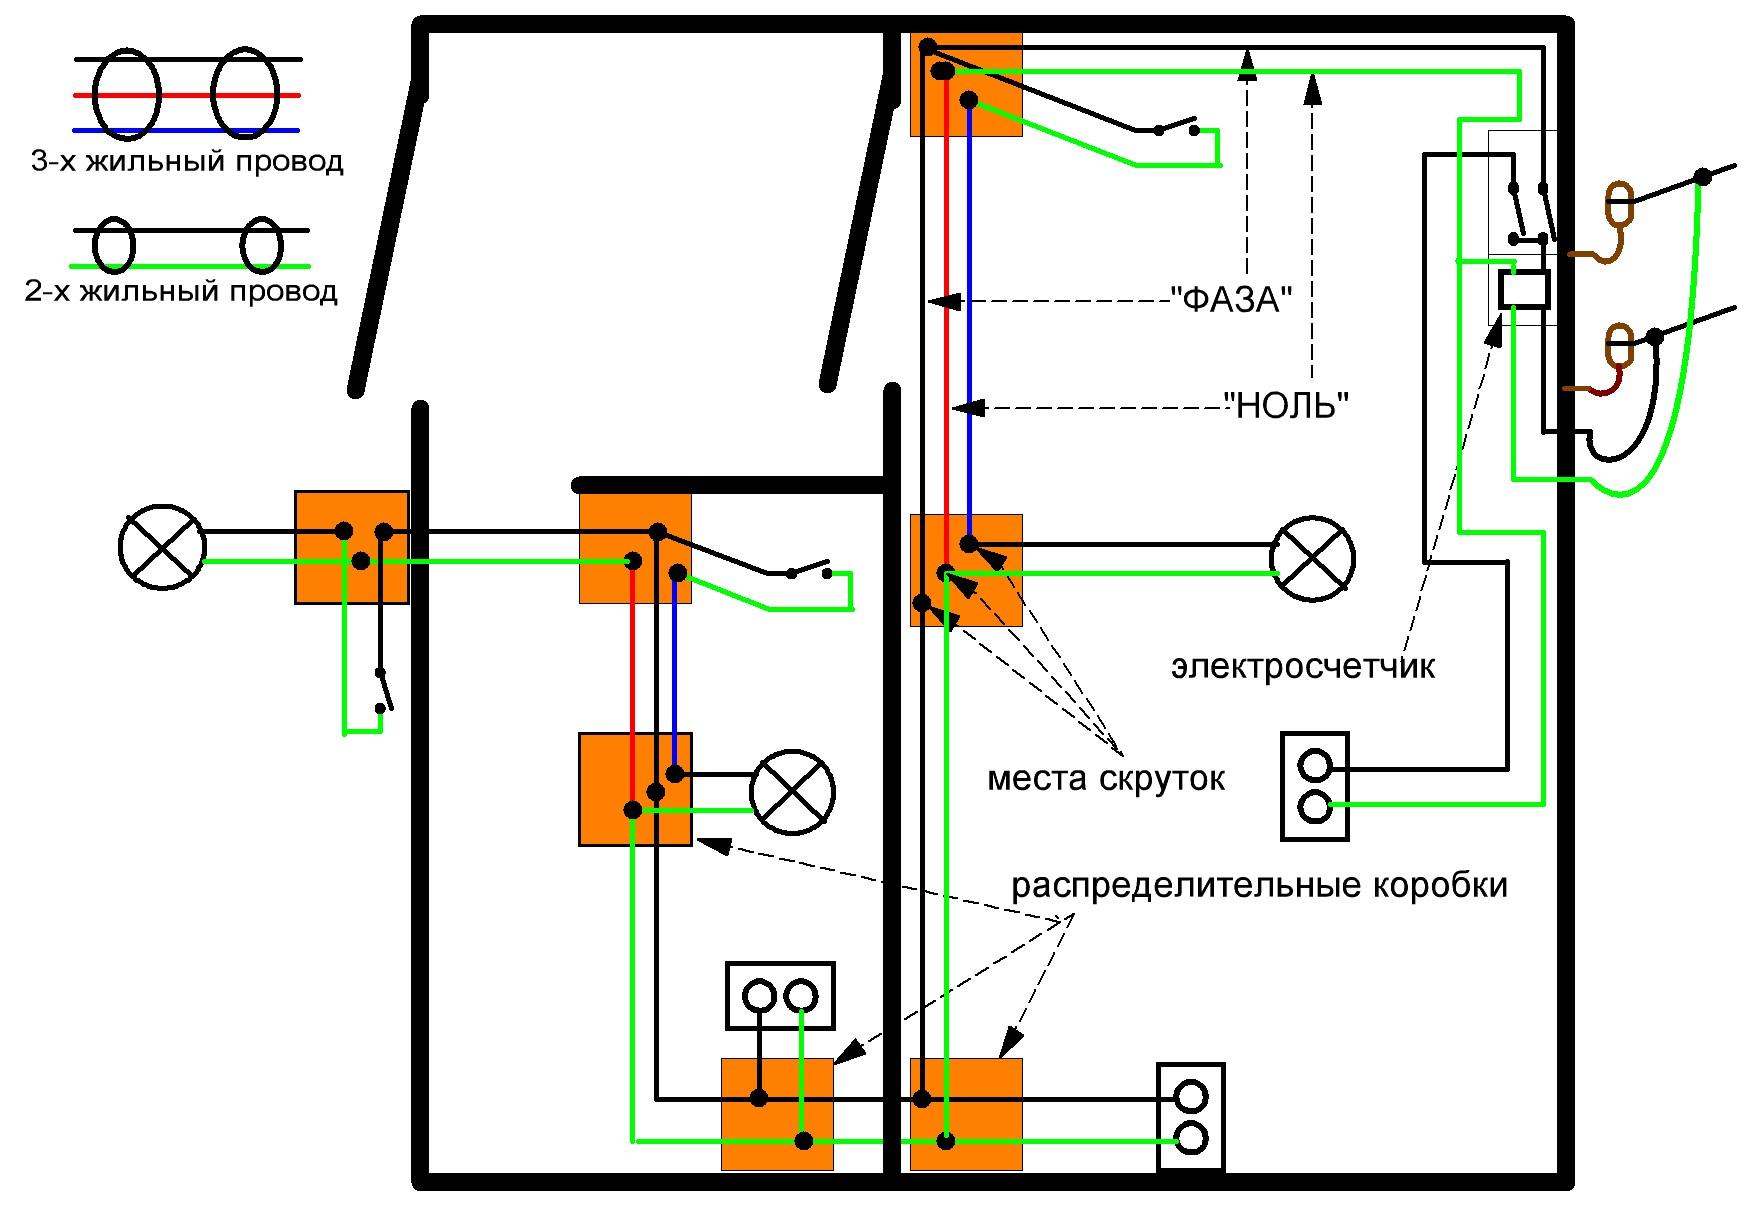 Кабельканалы для электропроводки: виды, типы